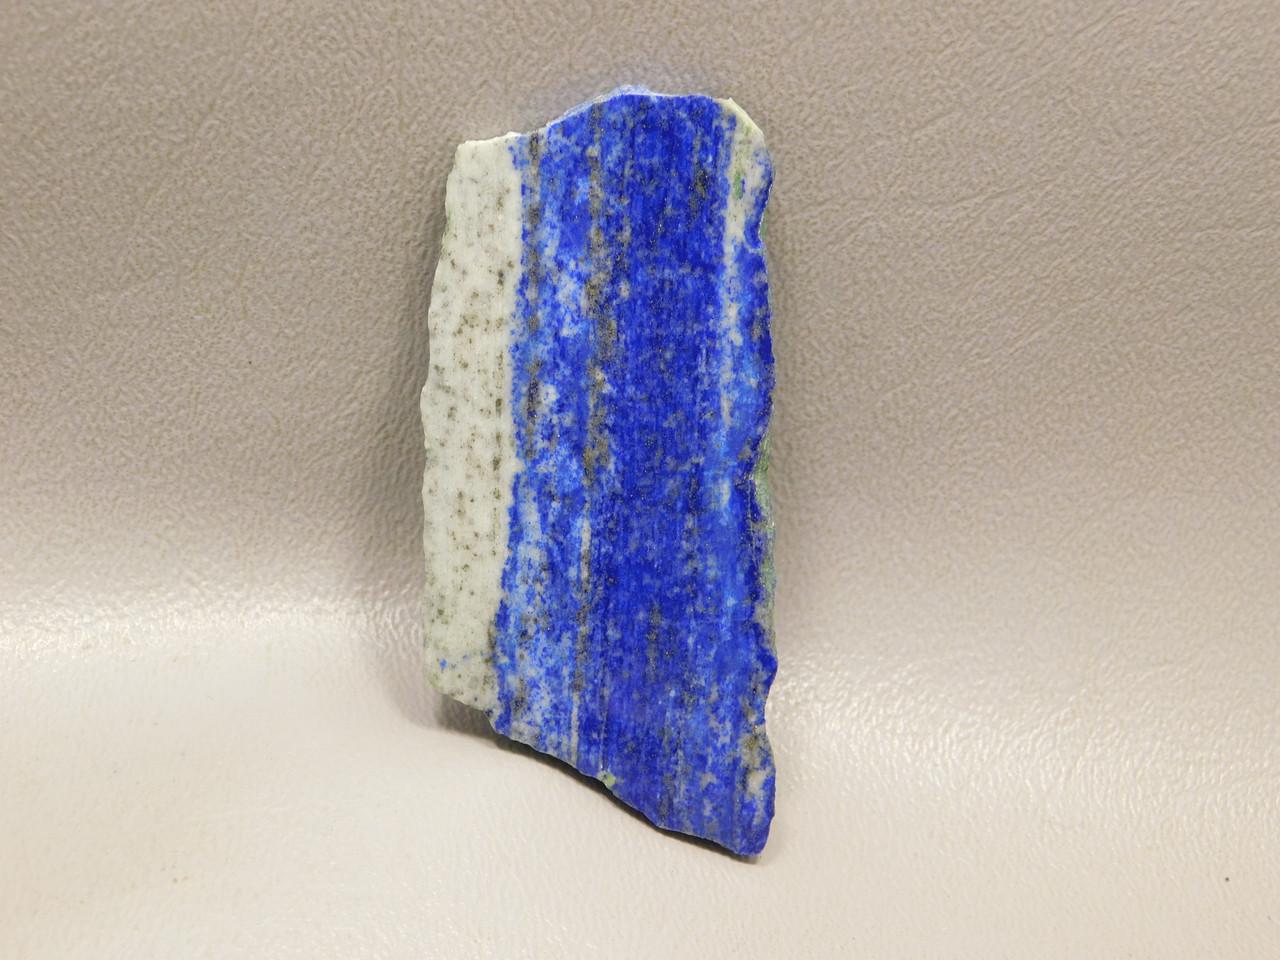 Long Natural Freeform Small Cabochon Polished Slab Lapis Lazuli #s6